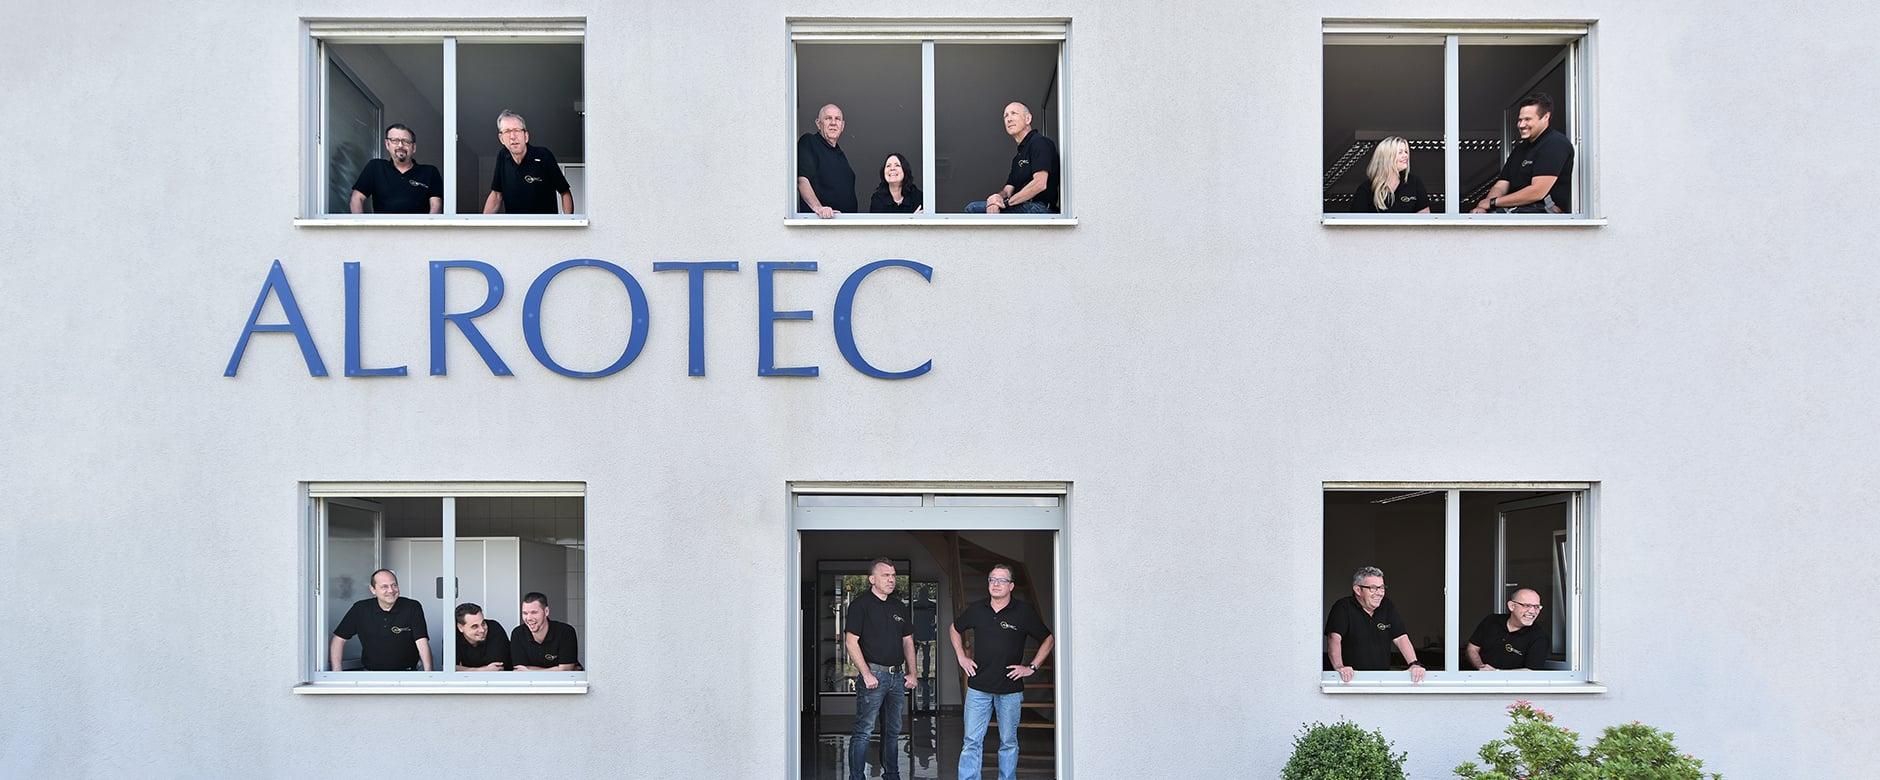 Das ALROTEC-Team im ALROTEC-Gebäude